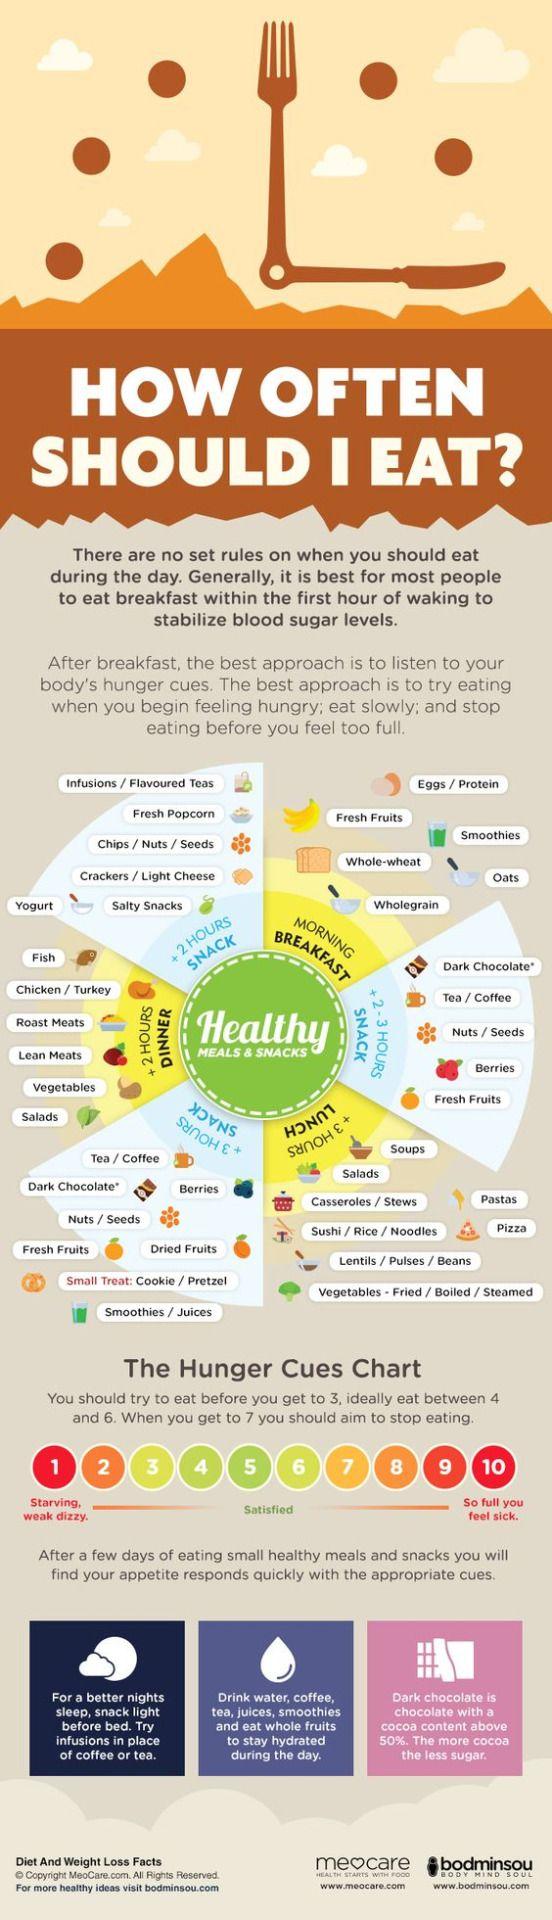 How often should I eat?